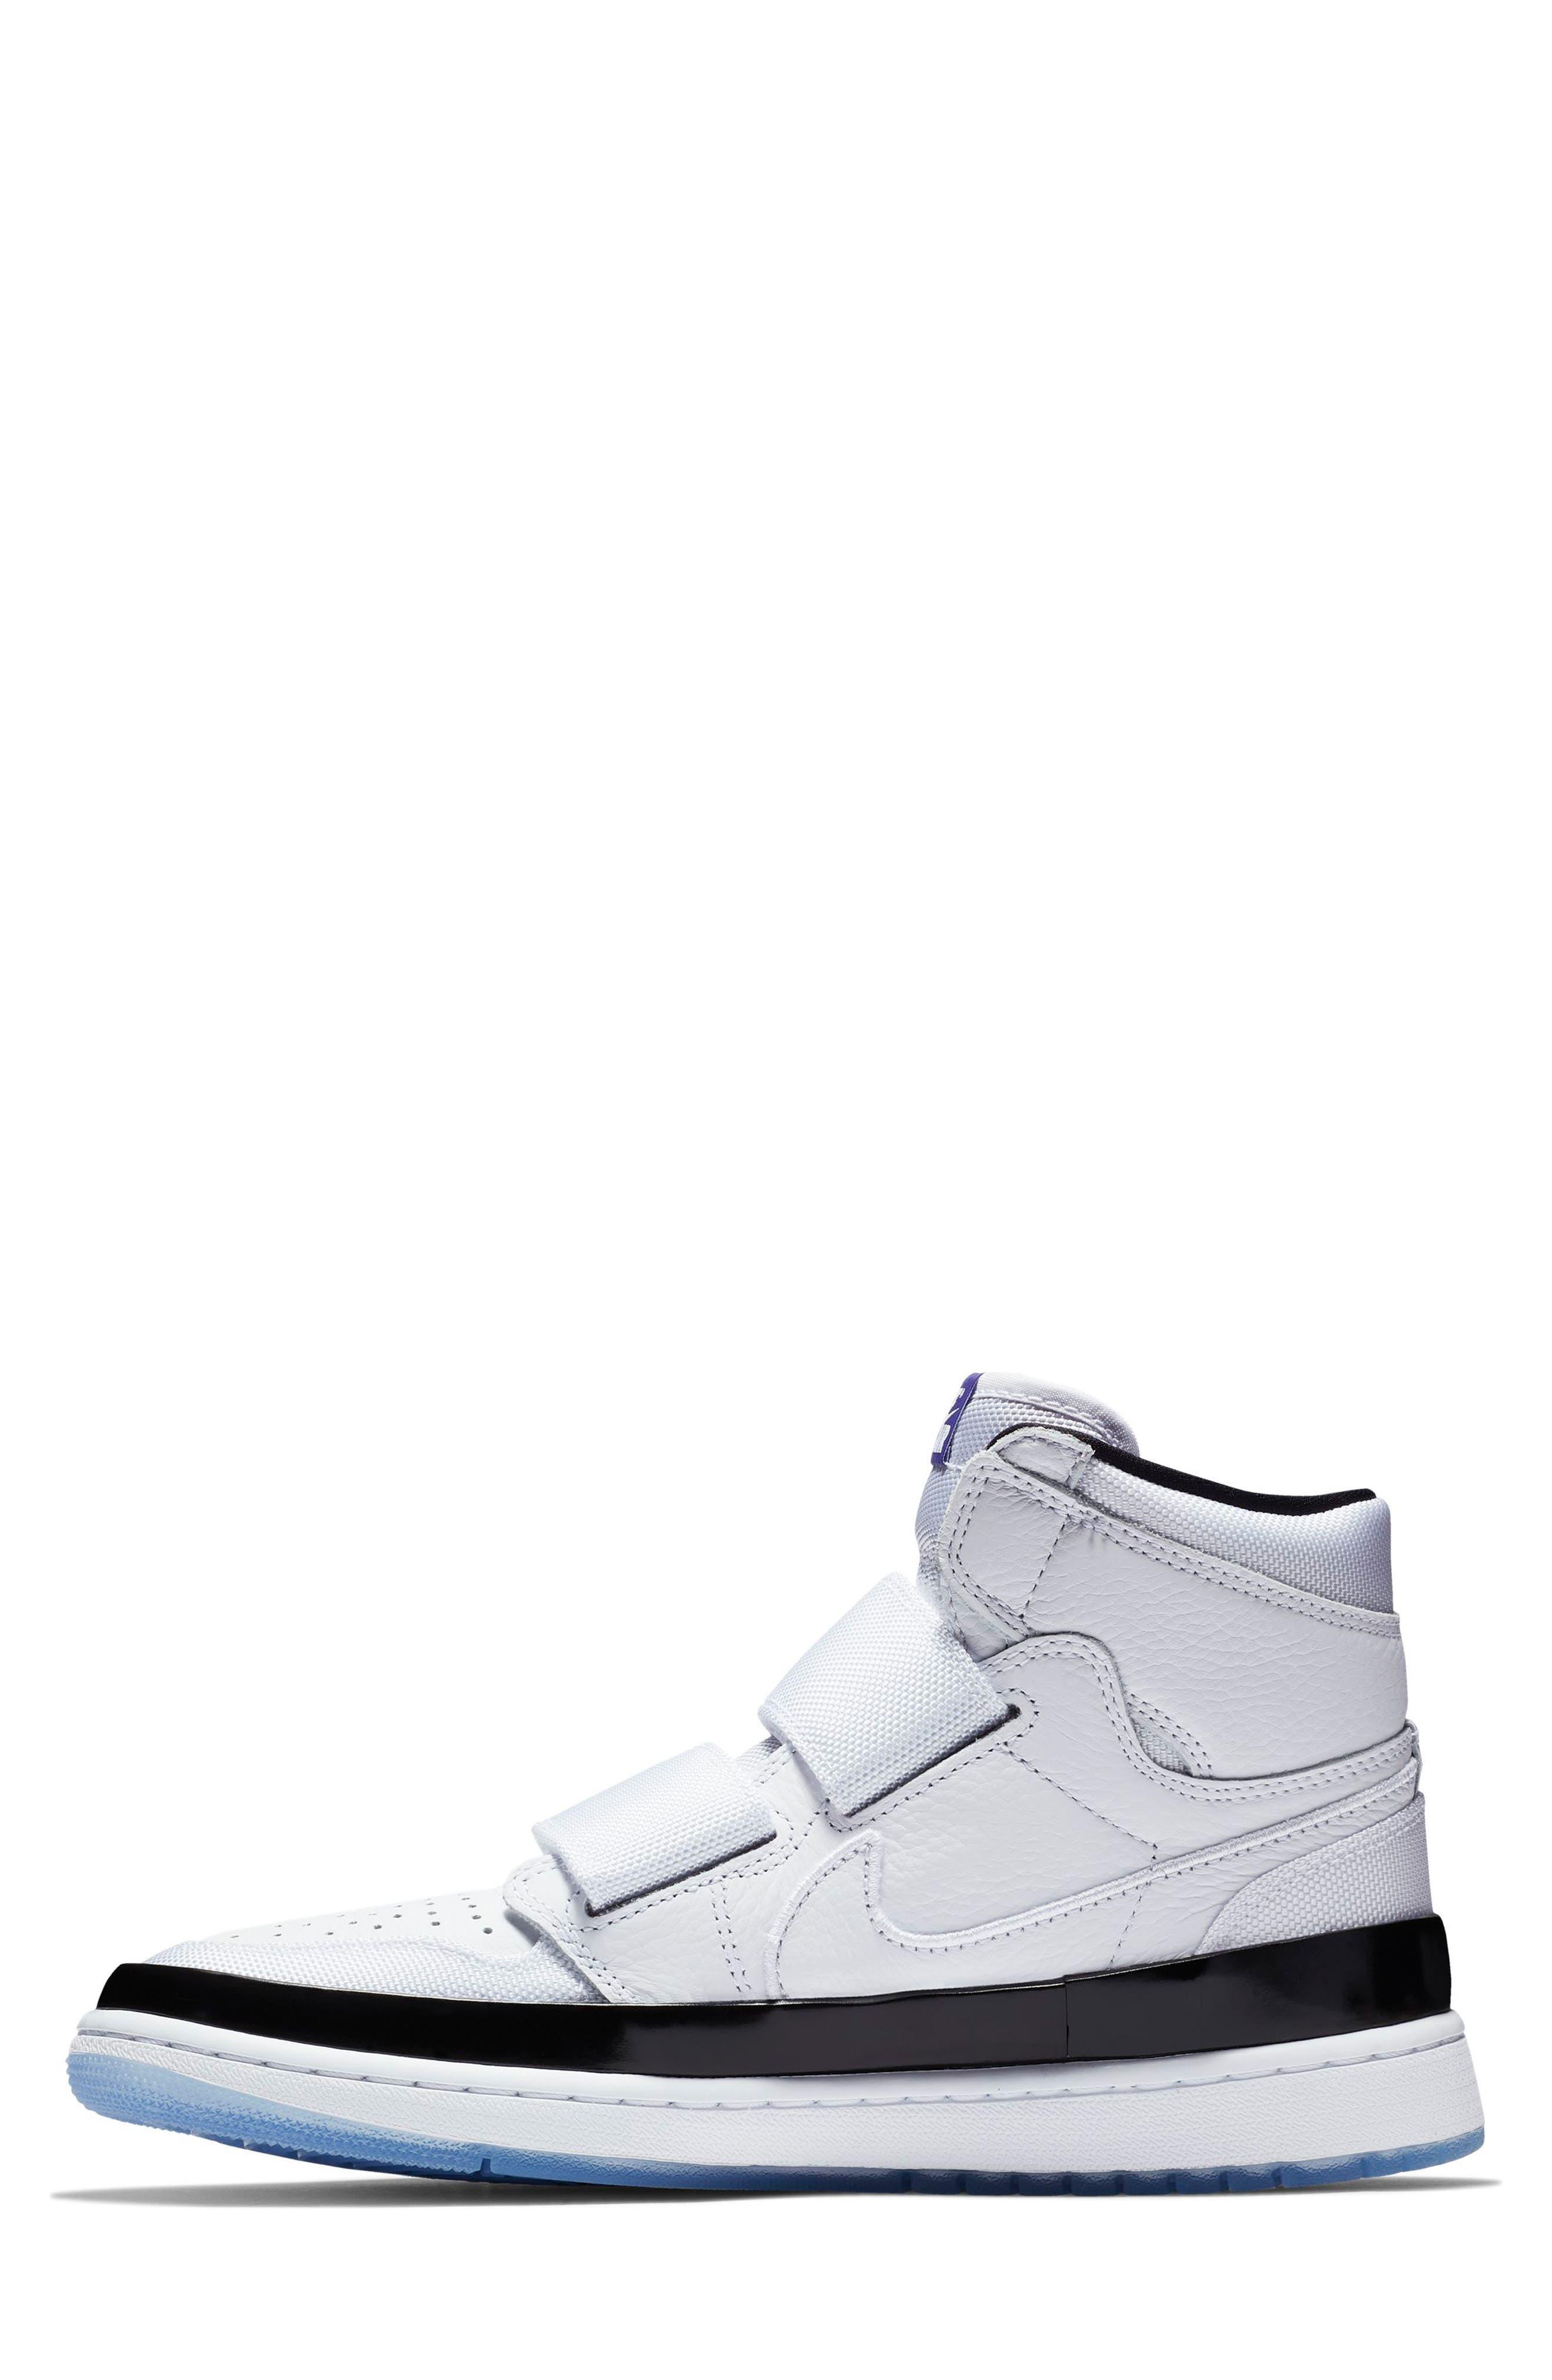 Air Jordan 1 Retro High Double Strap Sneaker,                             Alternate thumbnail 6, color,                             WHITE/ DARK CONCORD/ BLACK